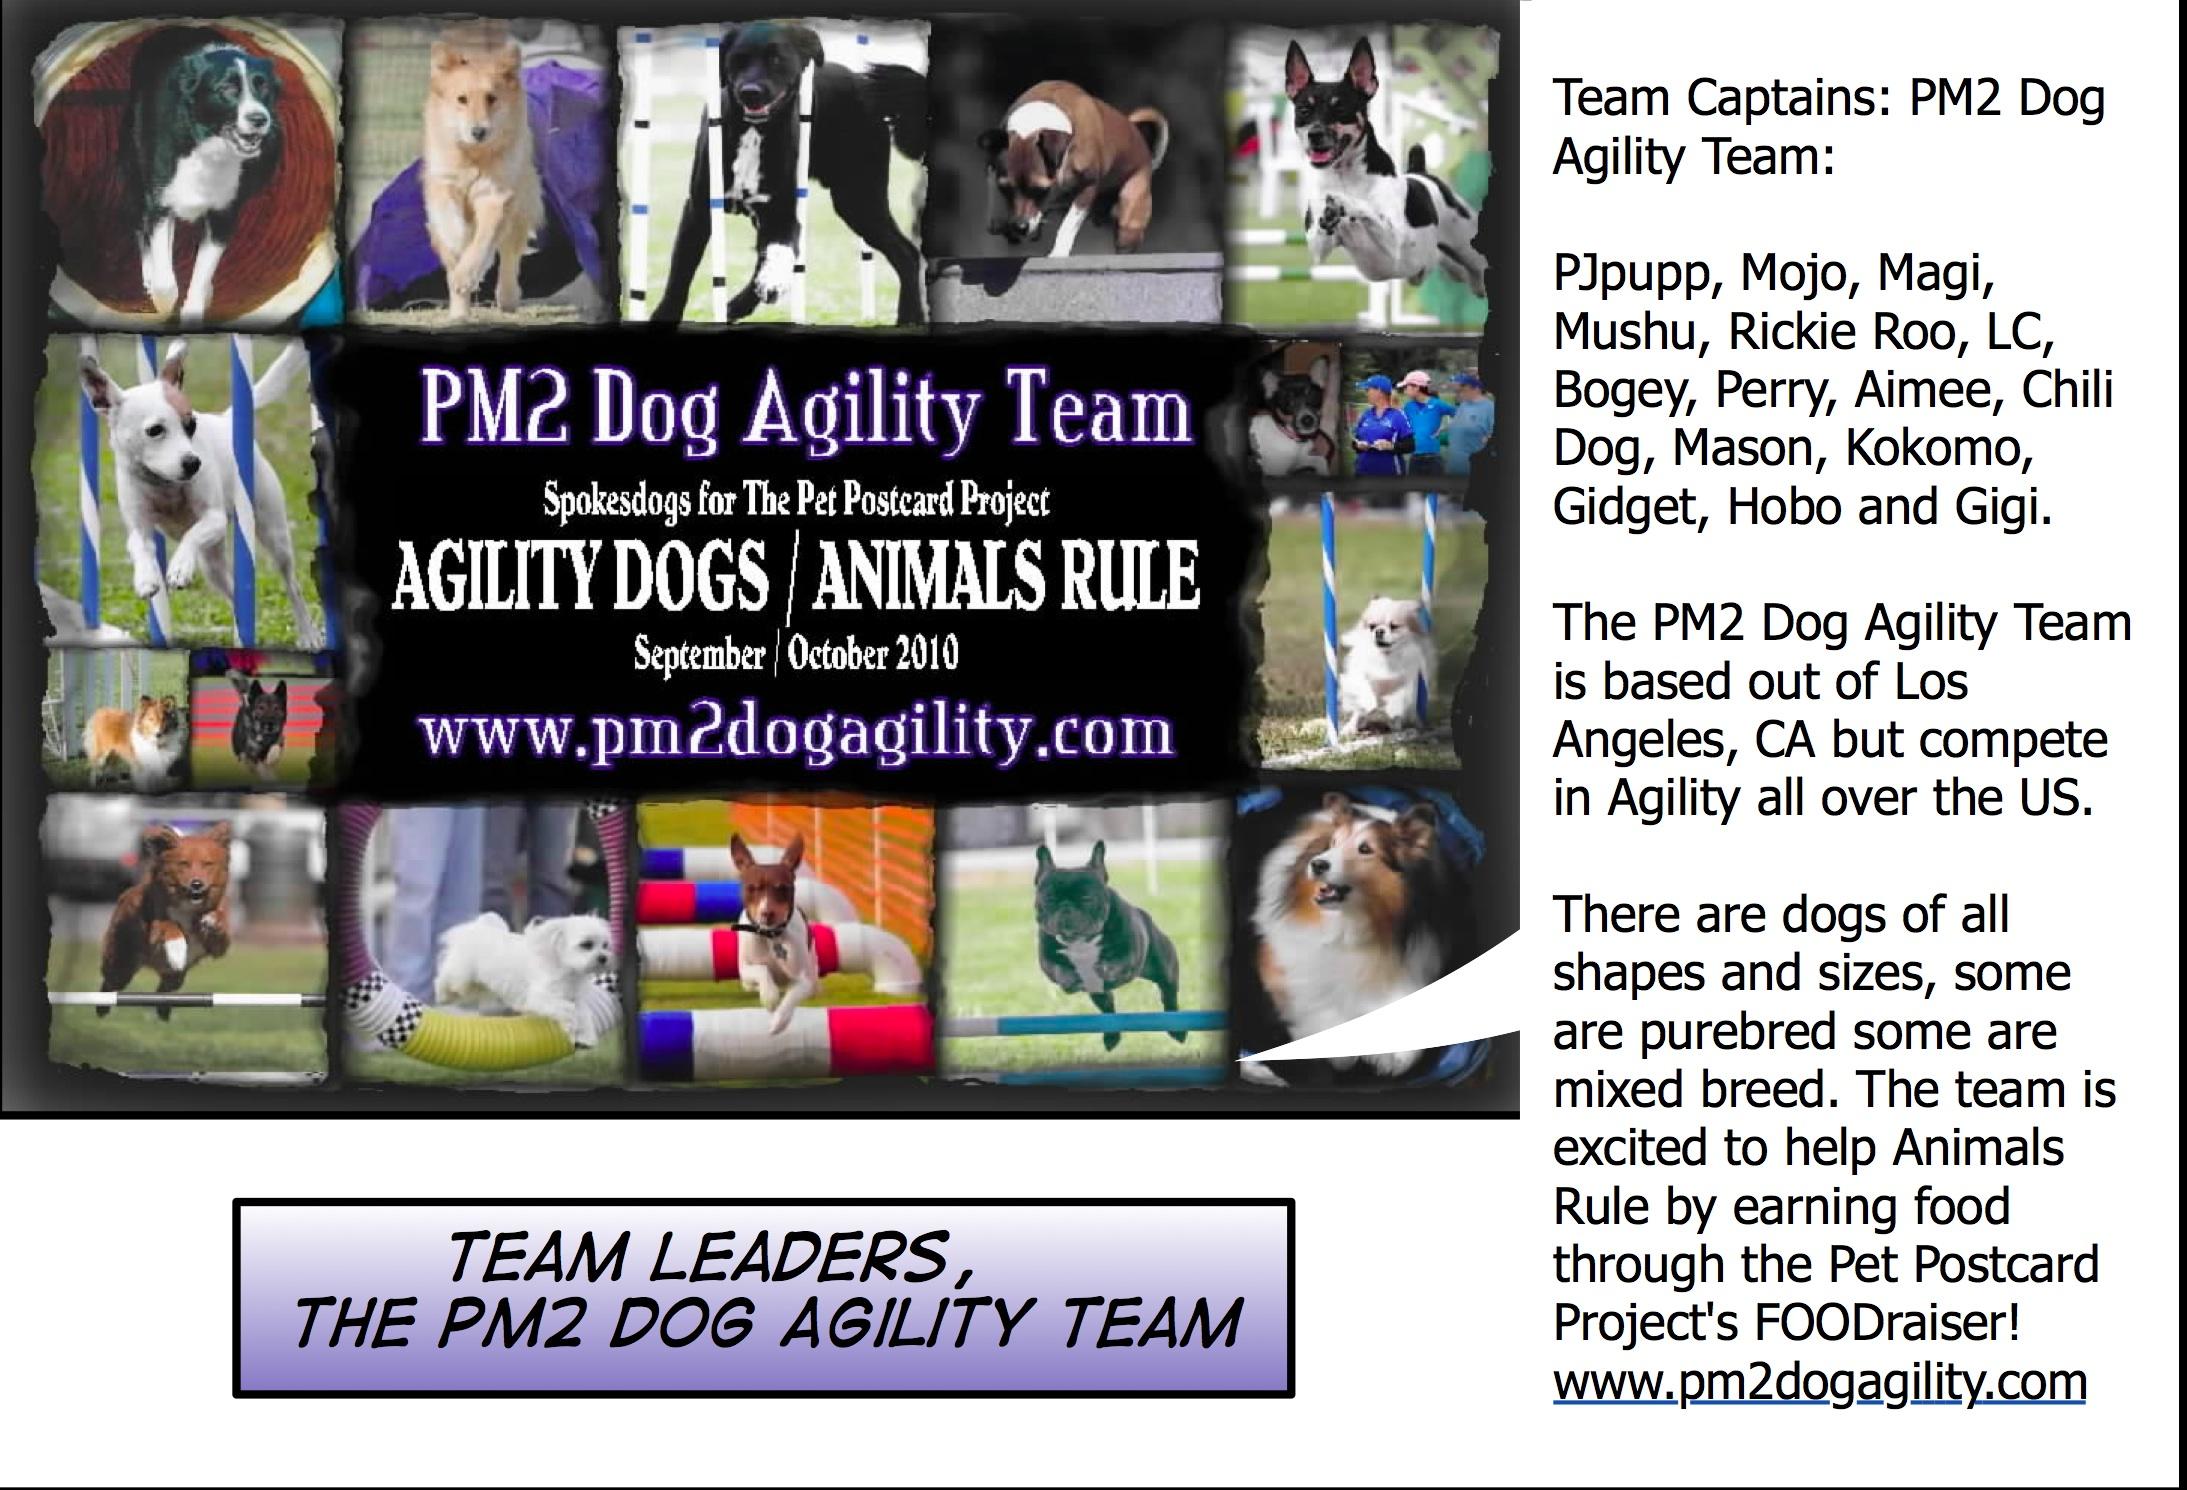 www.PM2dogagility.com